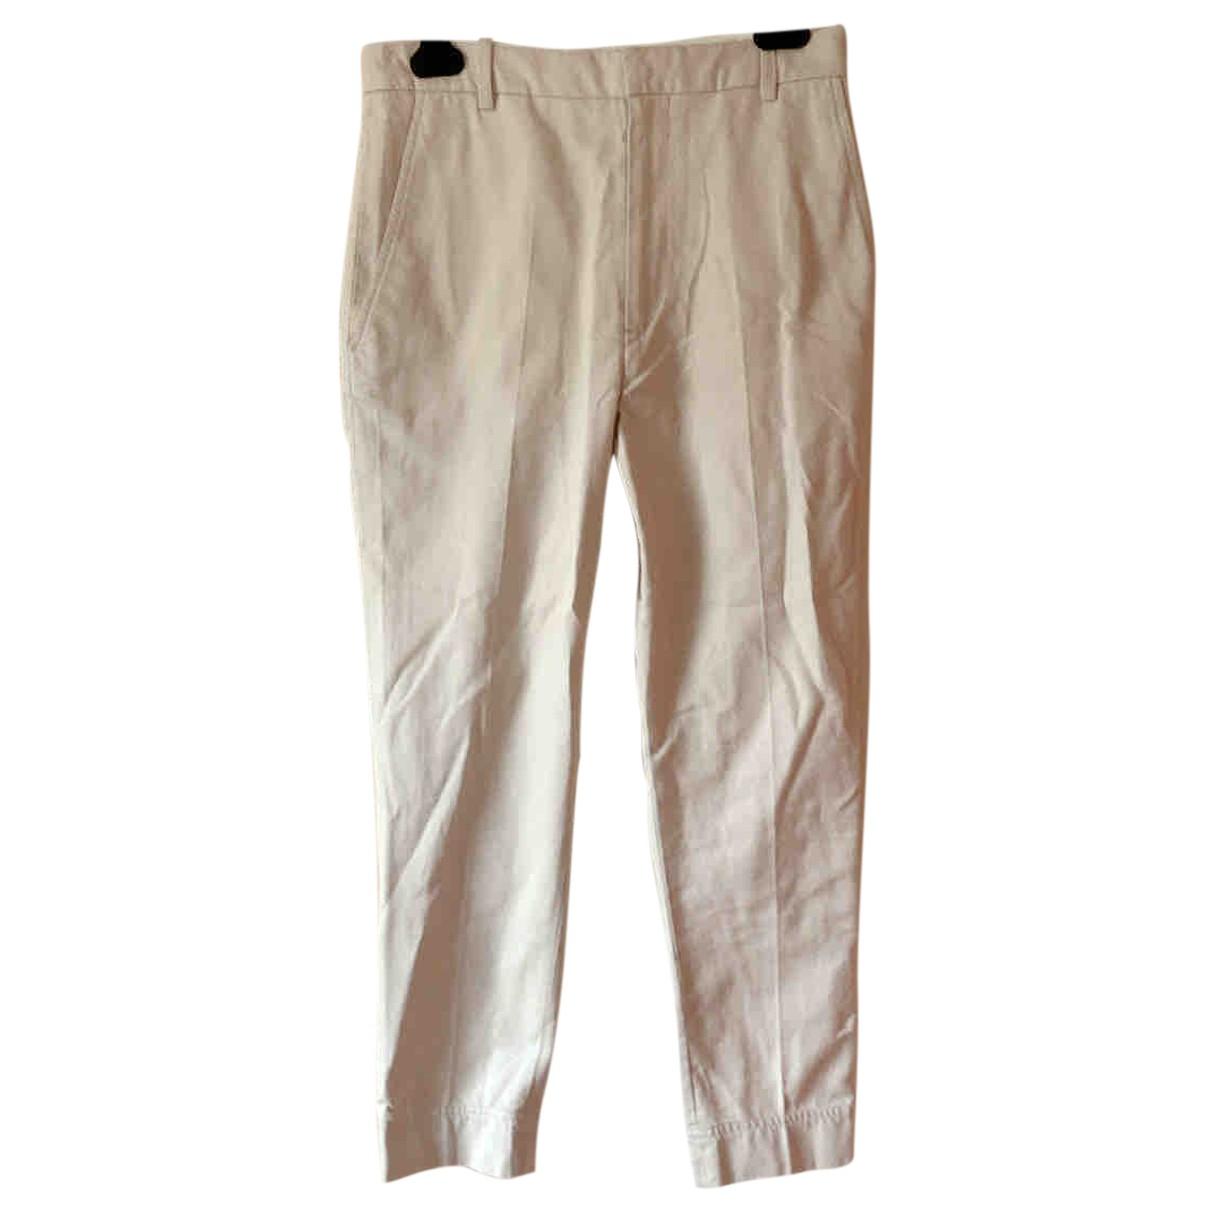 Isabel Marant Etoile N Ecru Cotton Trousers for Women 36 FR